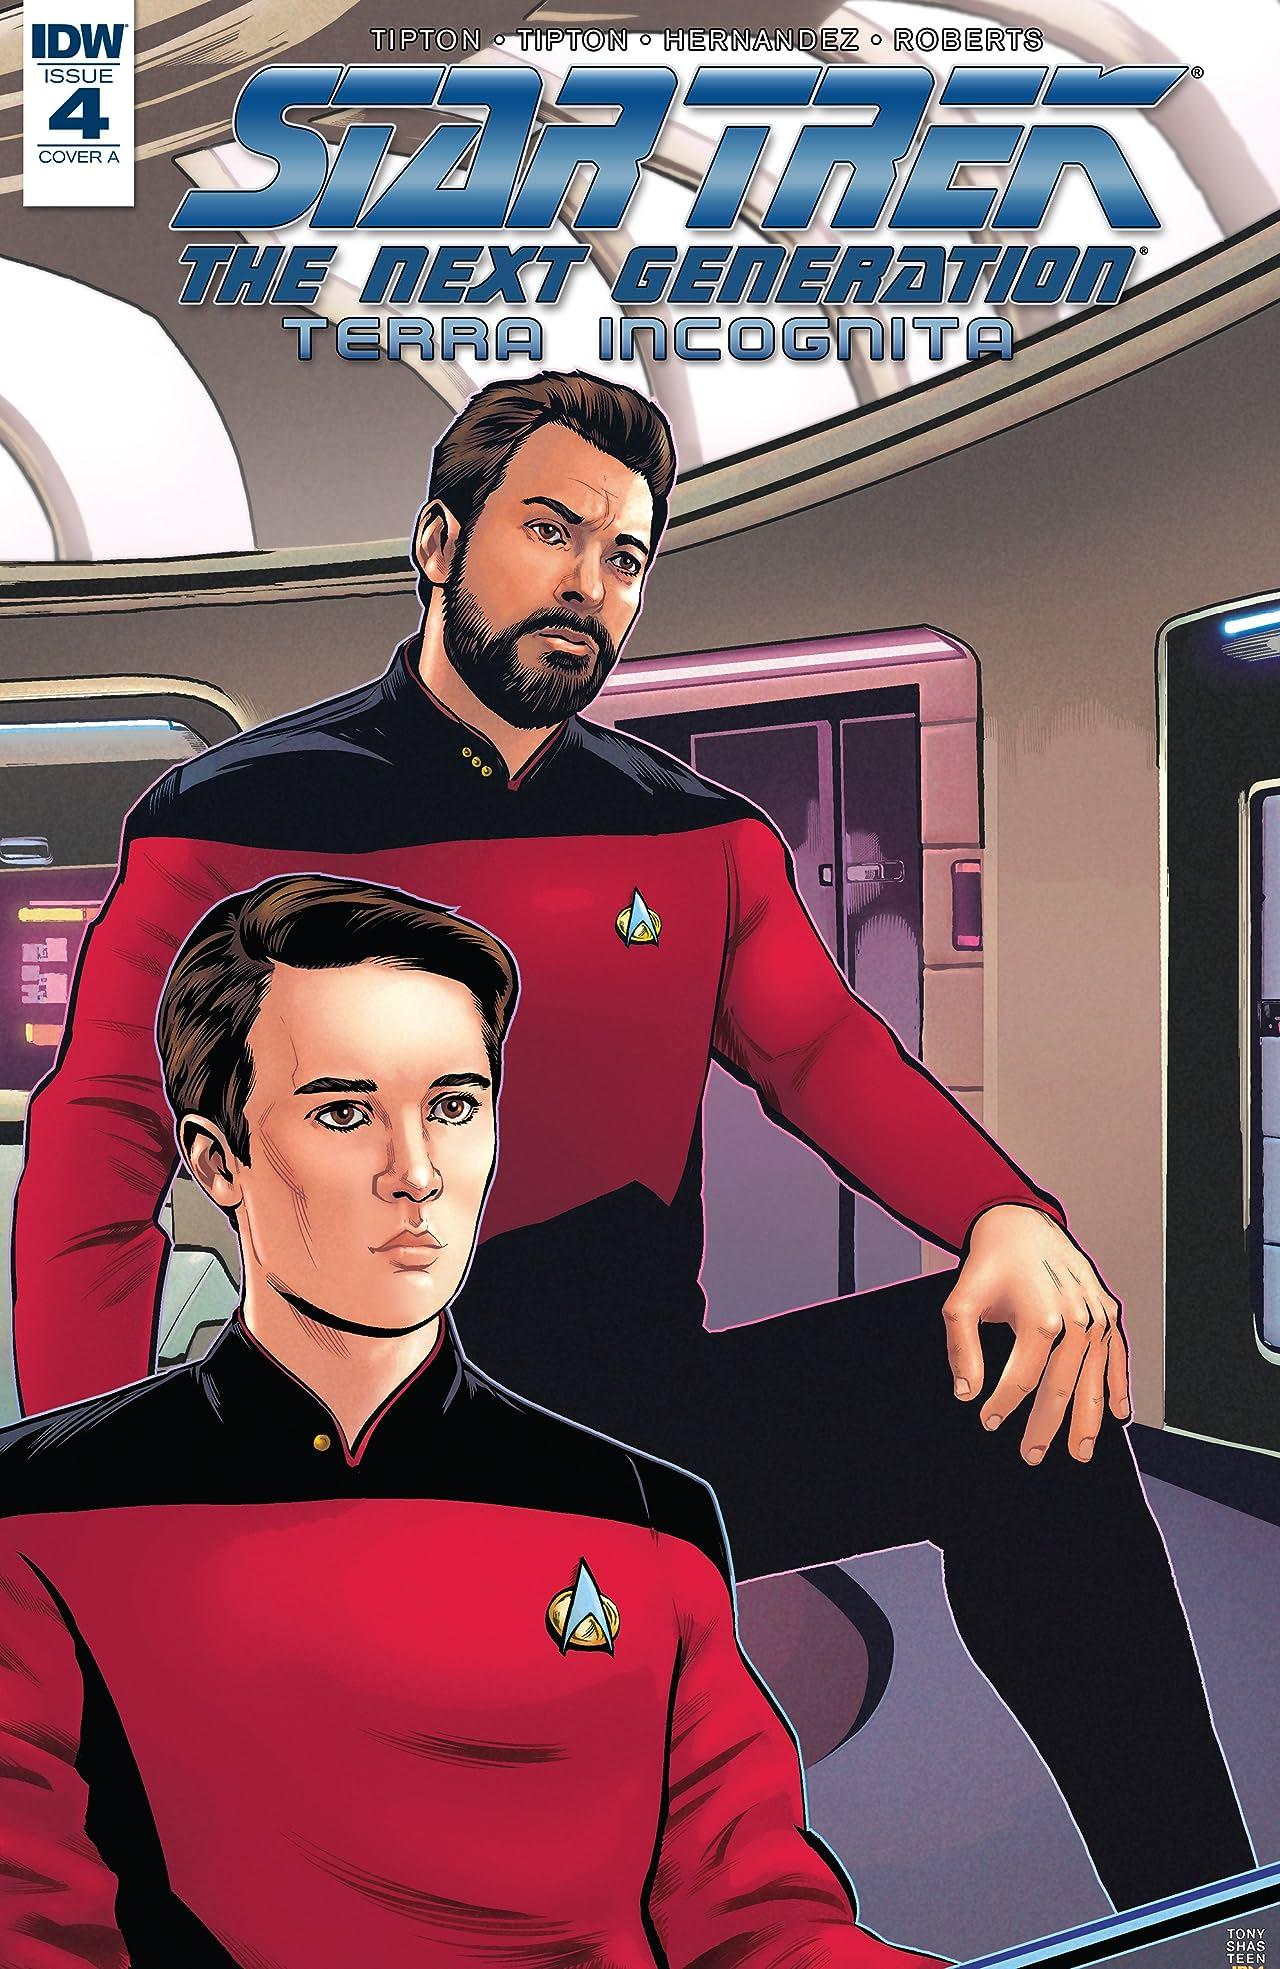 Star Trek: The Next Generation: Terra Incognita #4